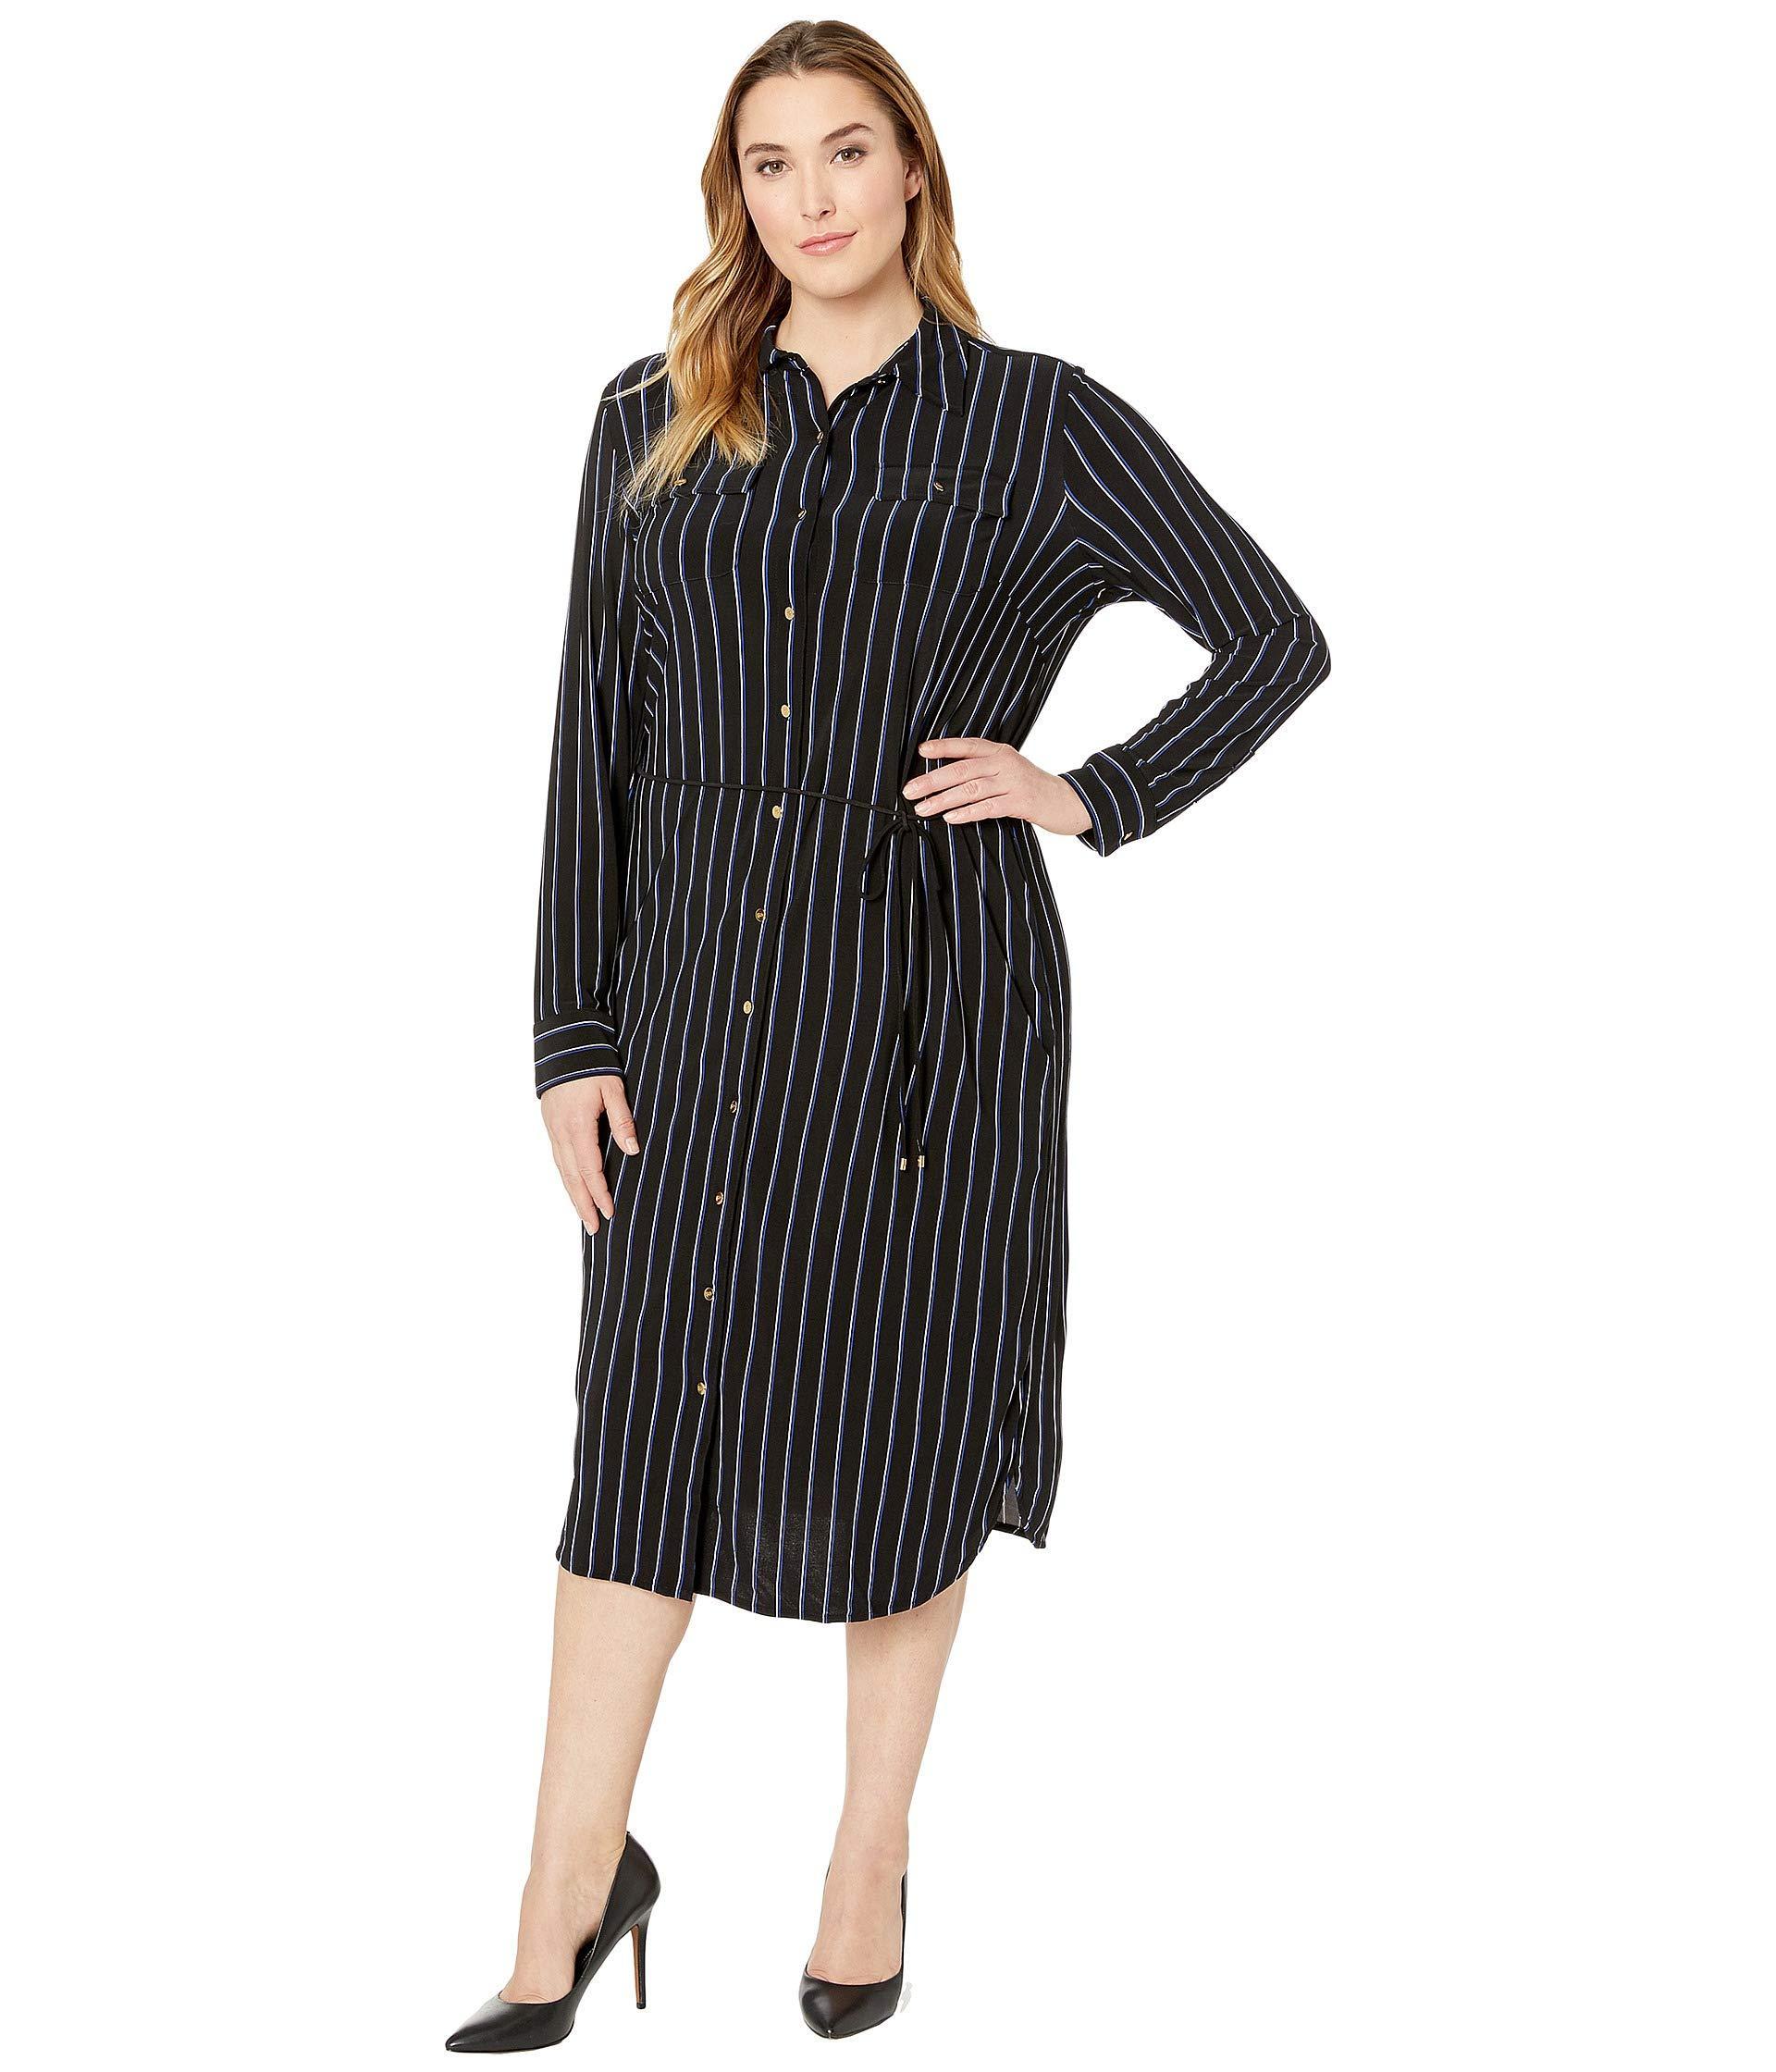 3c72064e00f8 Lauren by Ralph Lauren Plus Size Striped Jersey Shirtdress in Black ...